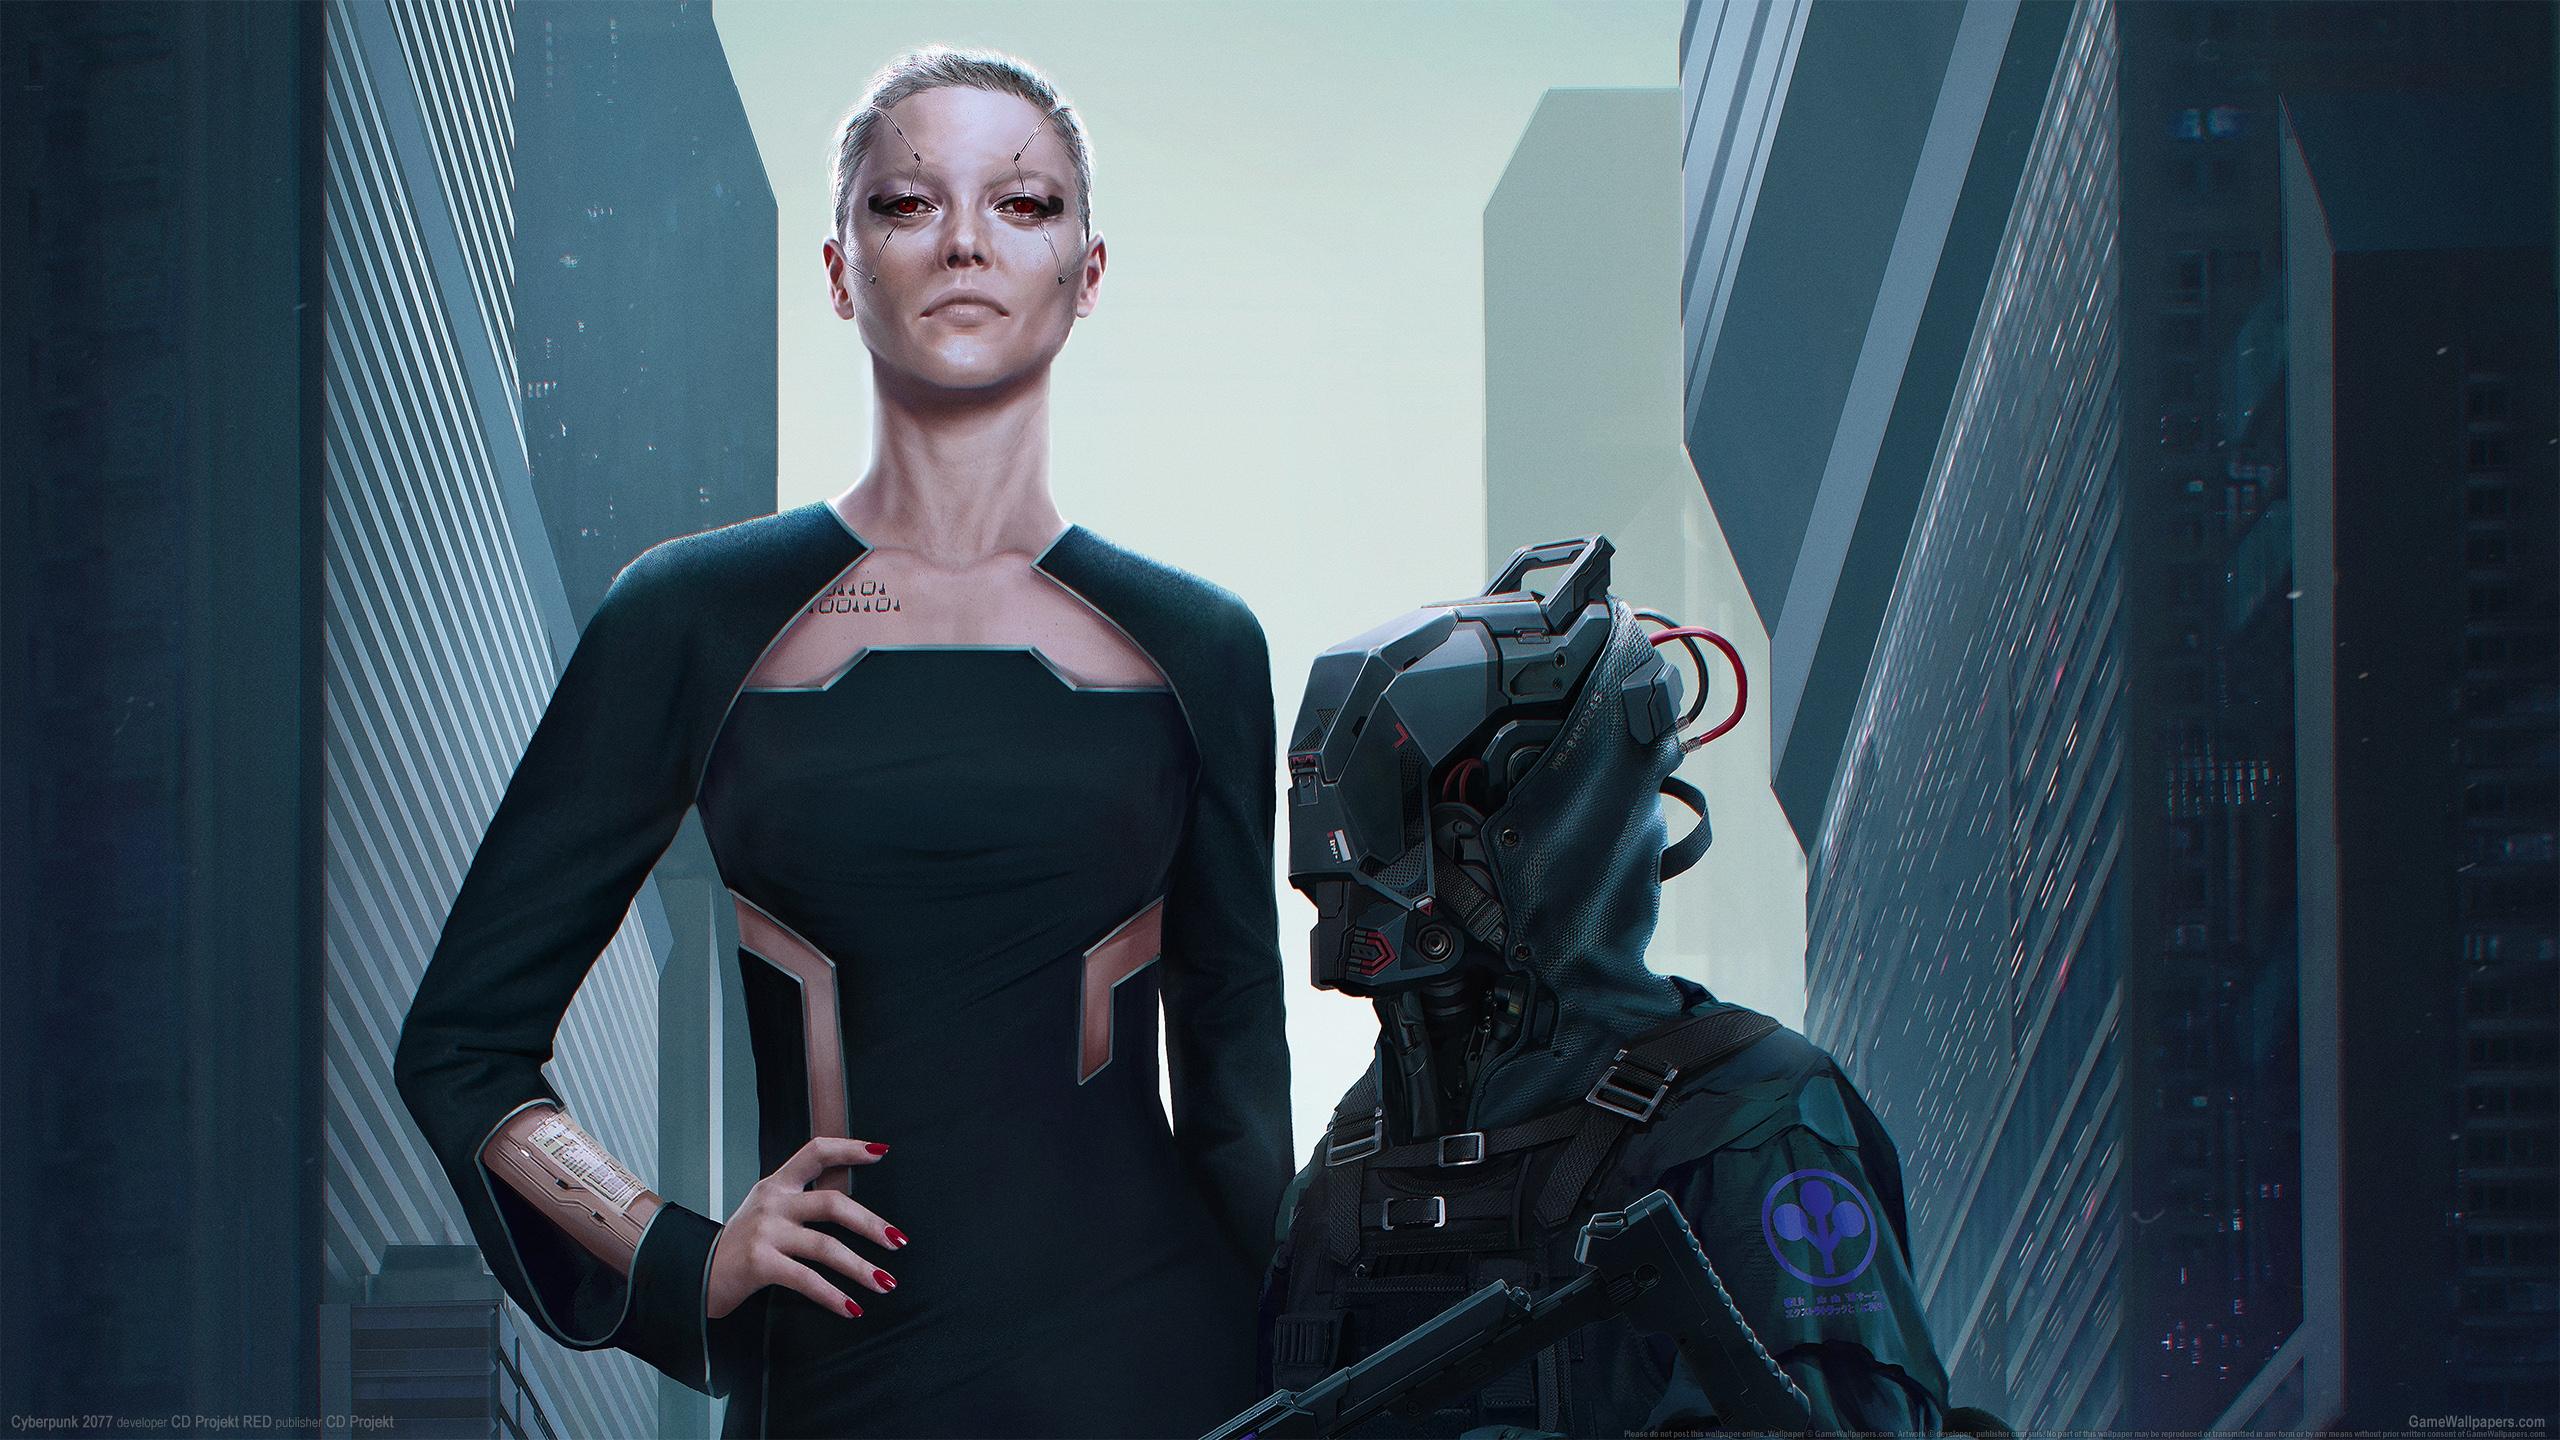 Cyberpunk 2077 2560x1440 fond d'écran 22